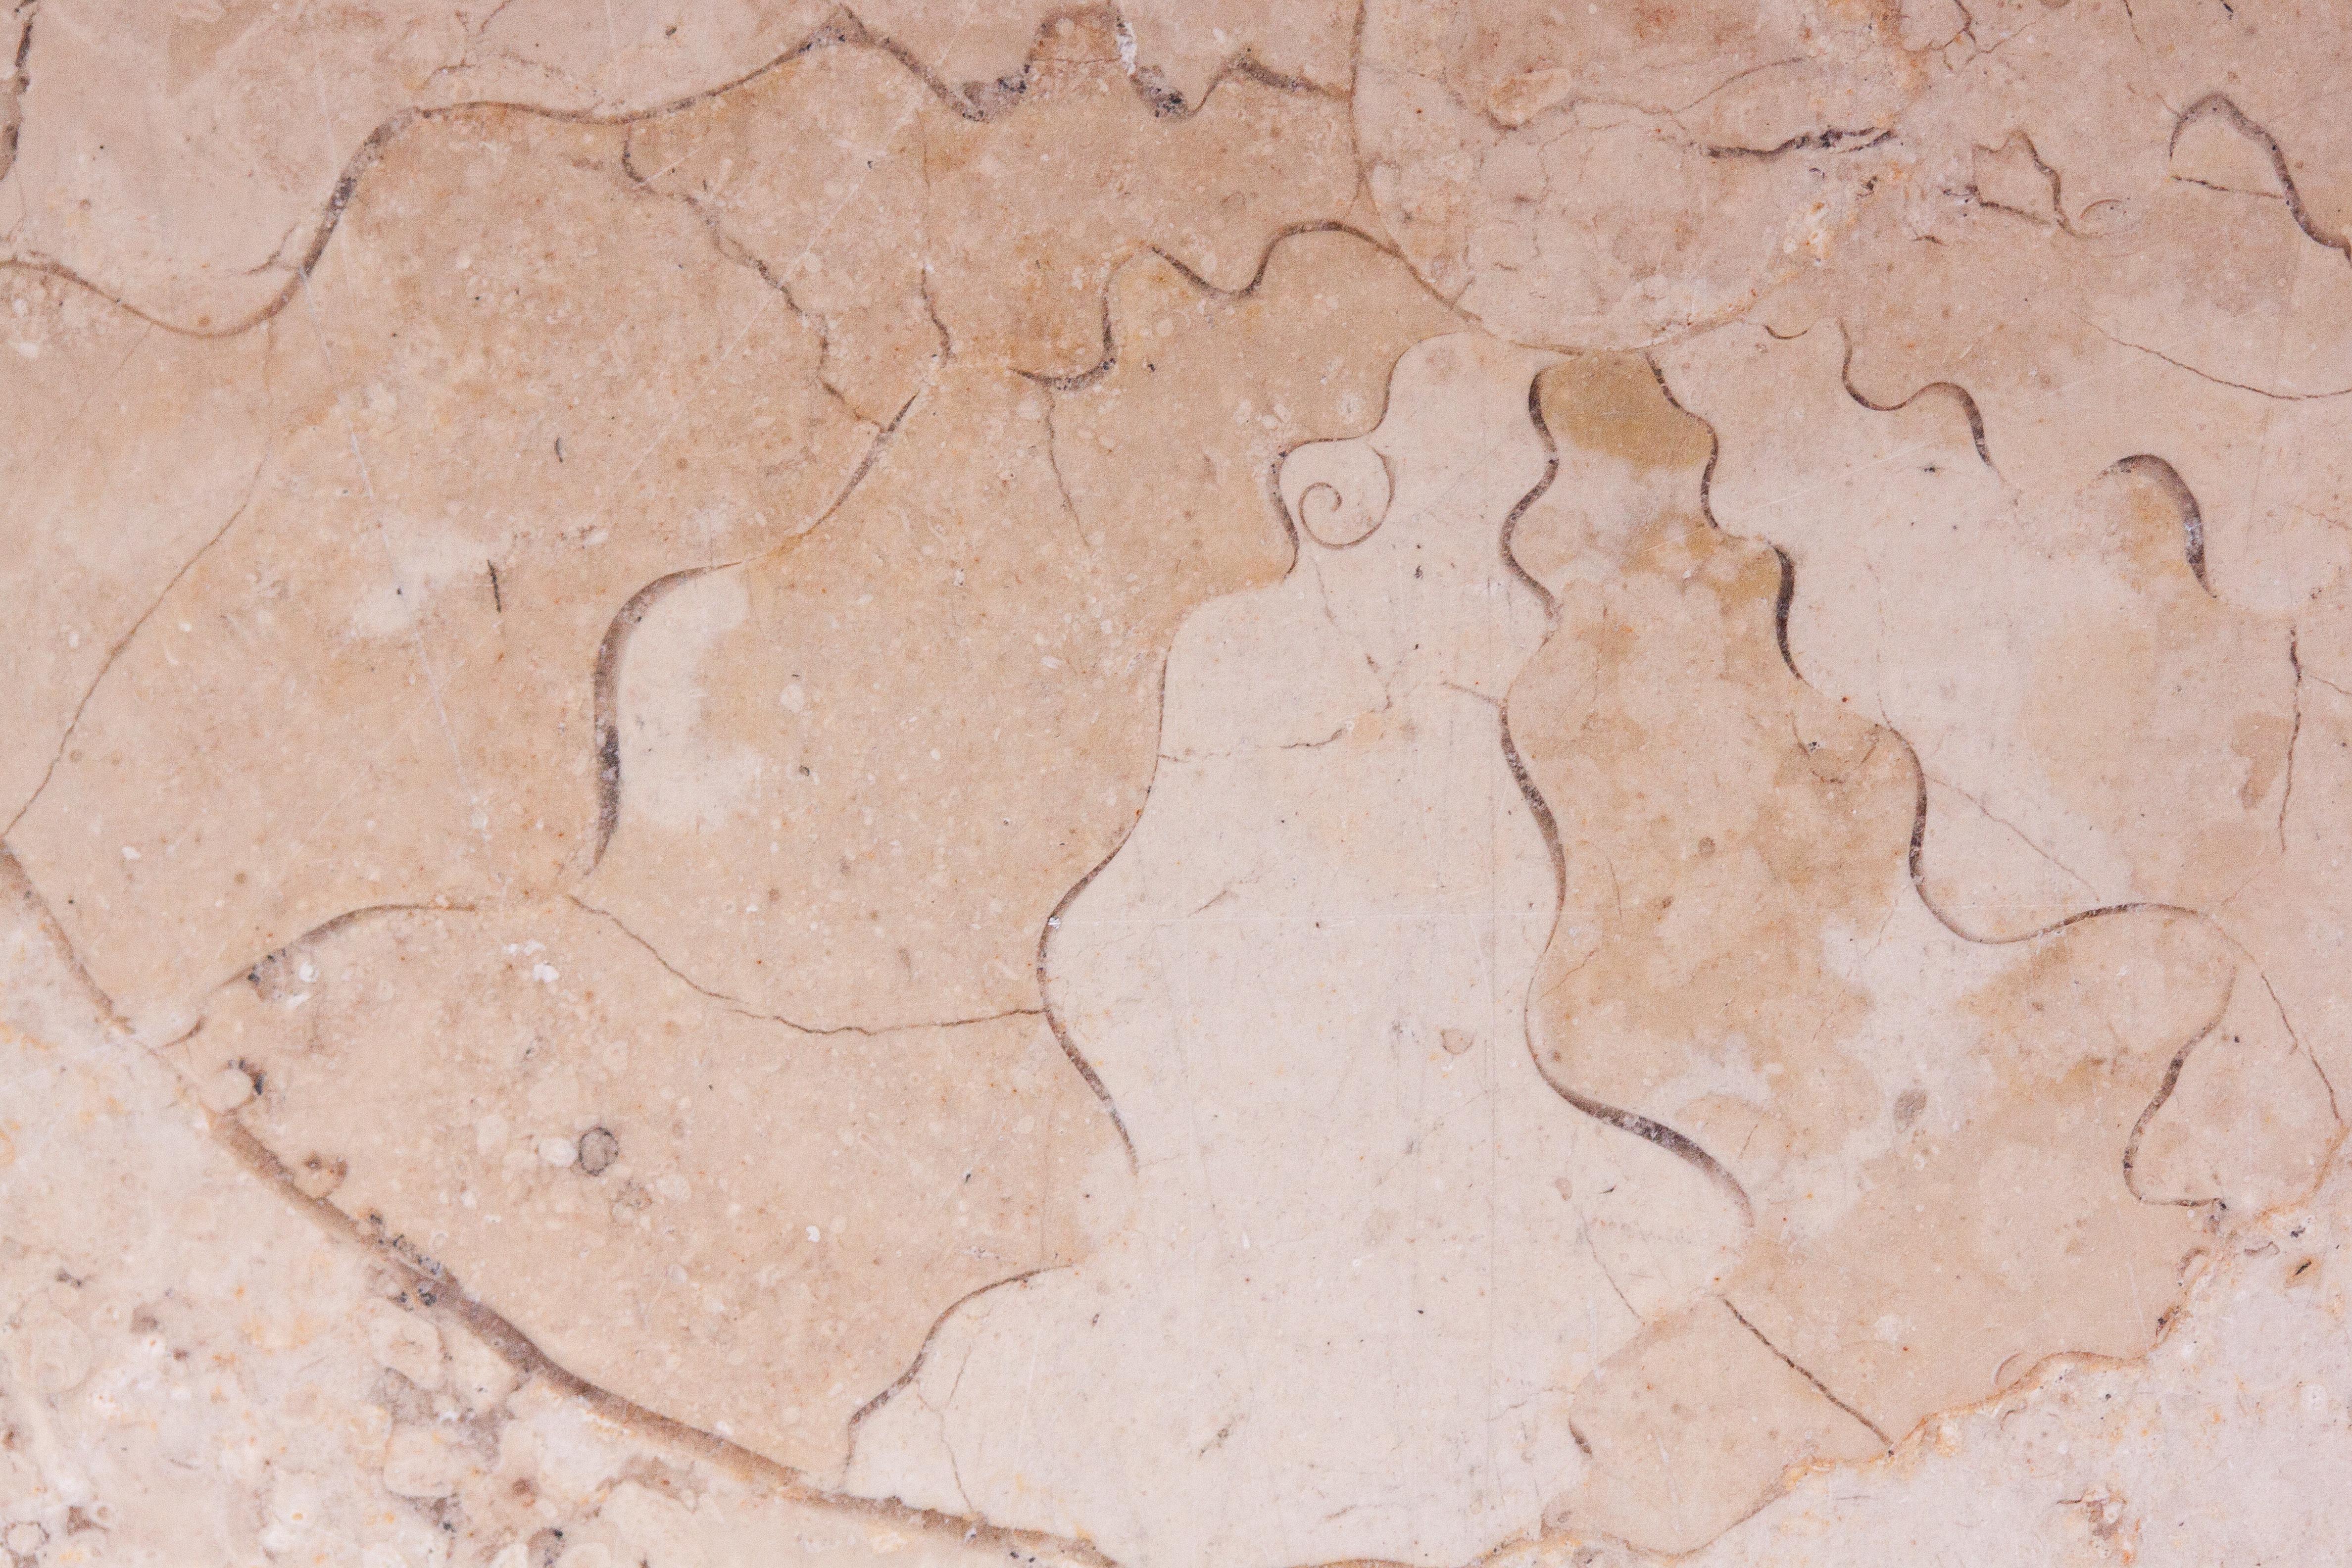 Free Images Sea Rock Texture Floor Wall Macro Soil